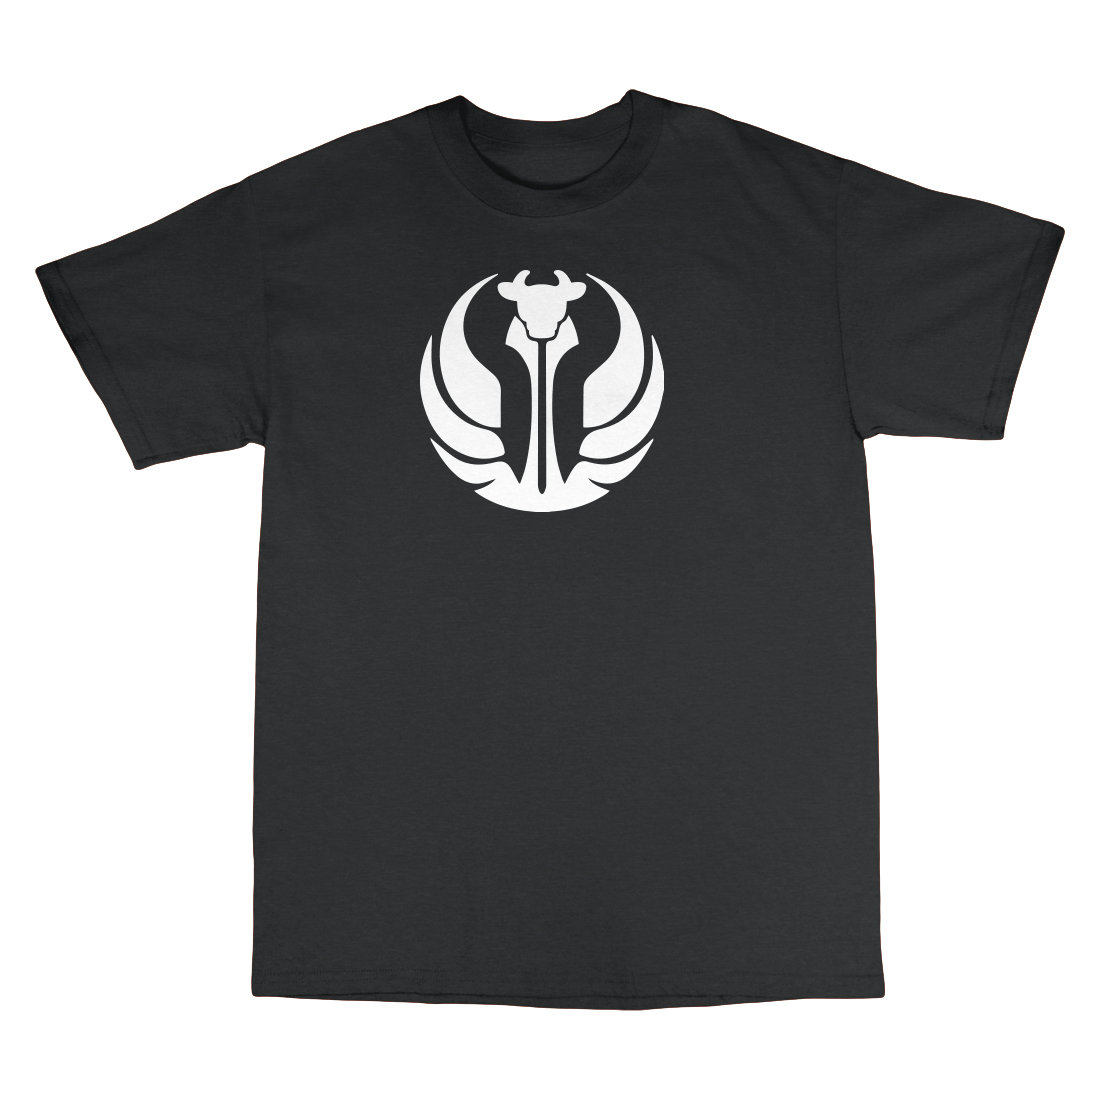 Unisex 'JedBull' T-Shirt JedBullTee